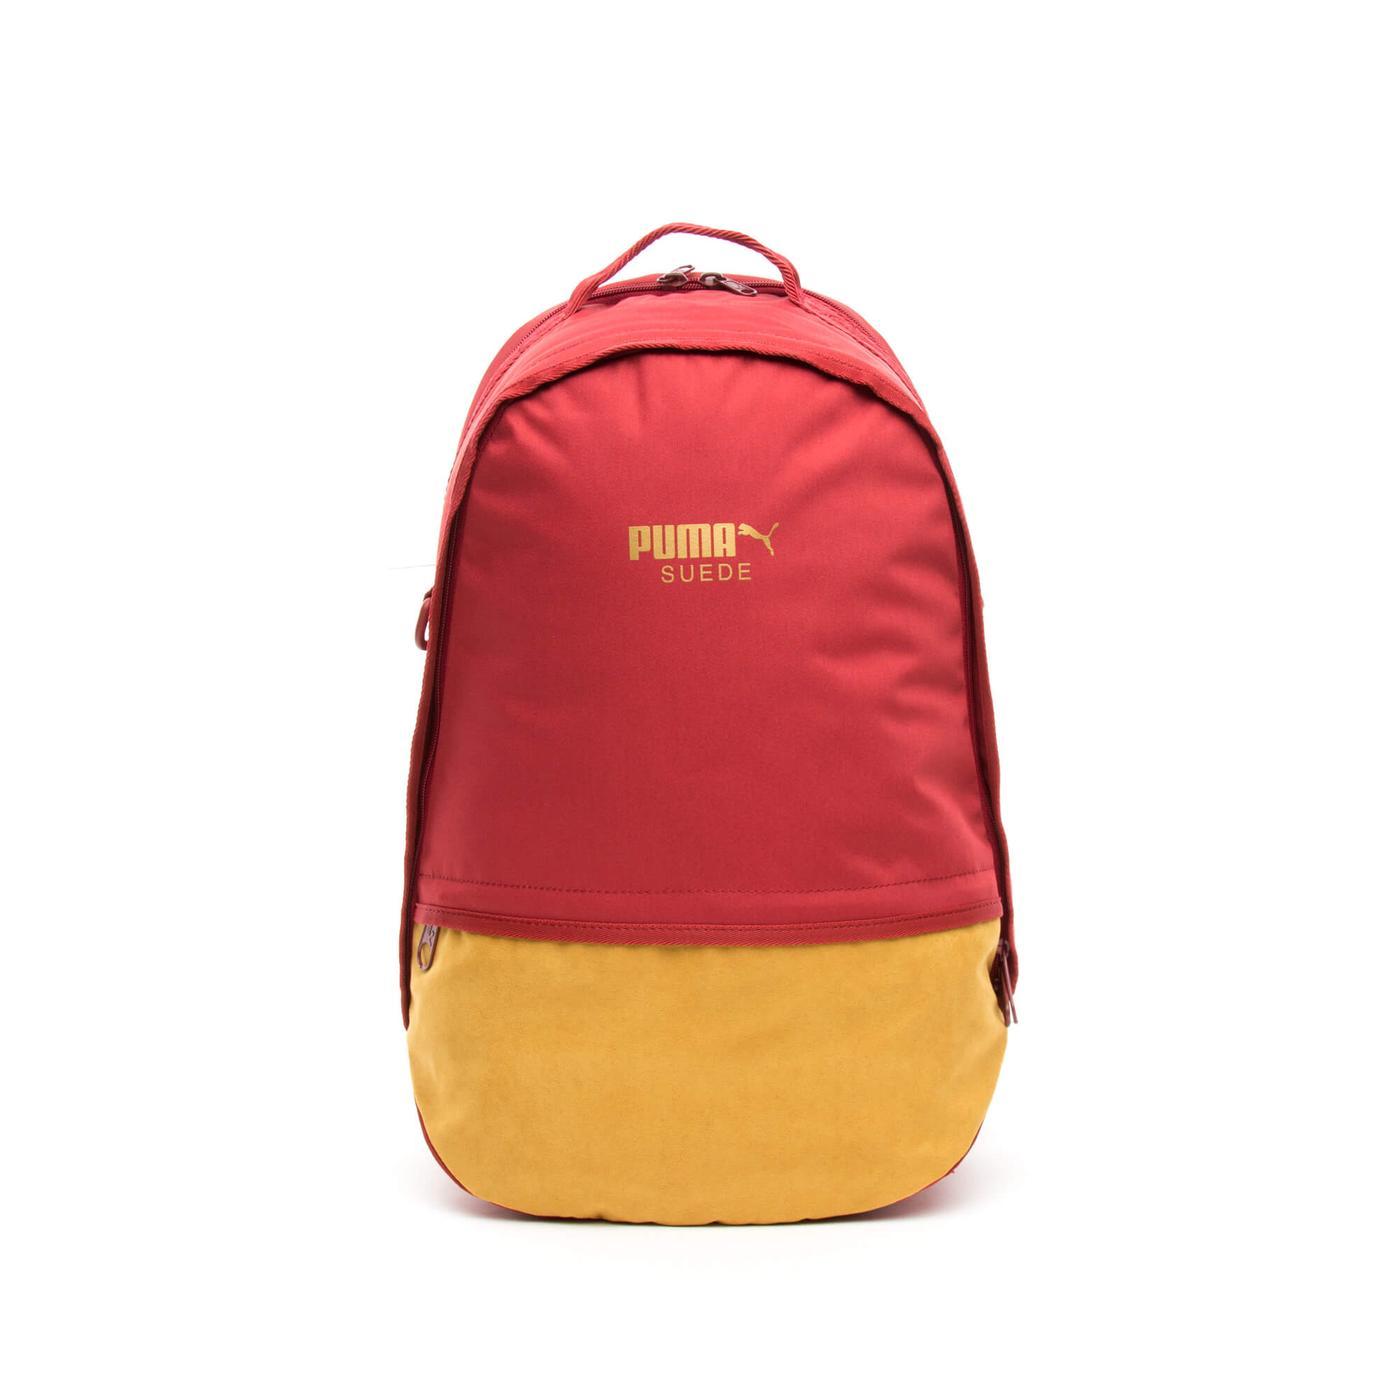 Puma Suede Backpack Unisex